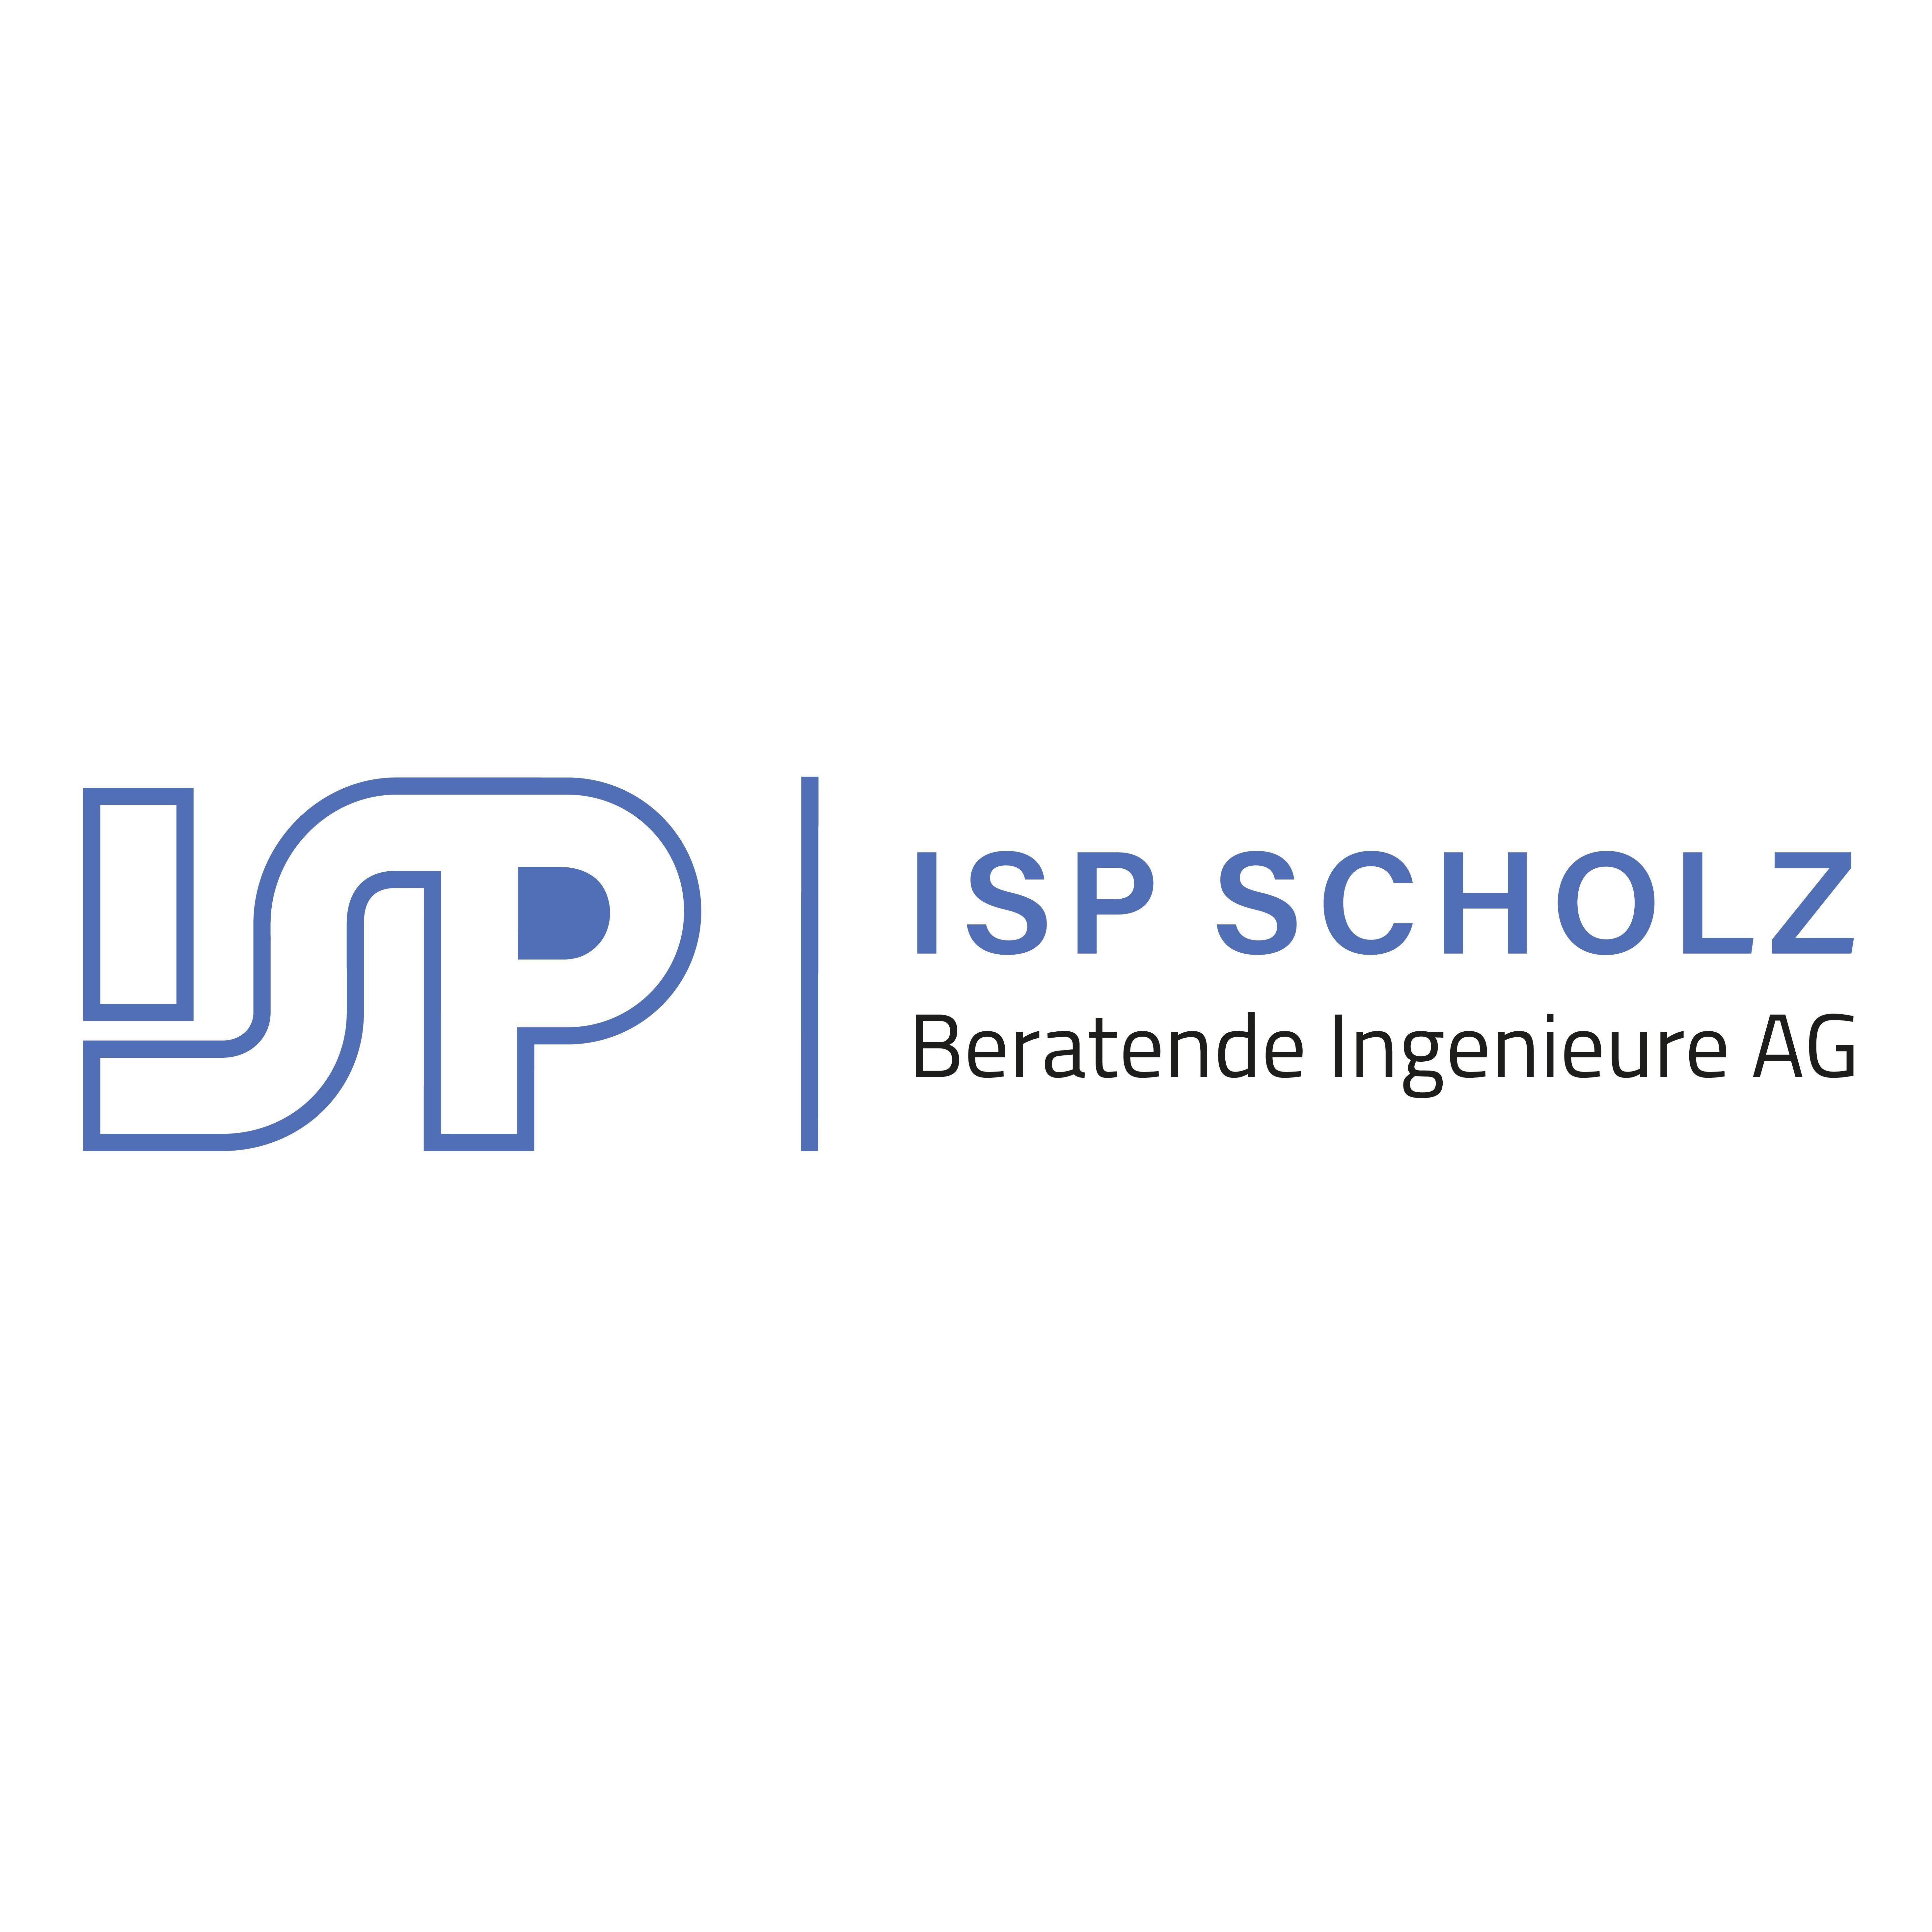 Bild zu ISP Scholz Beratende Ingenieure AG in Nürnberg